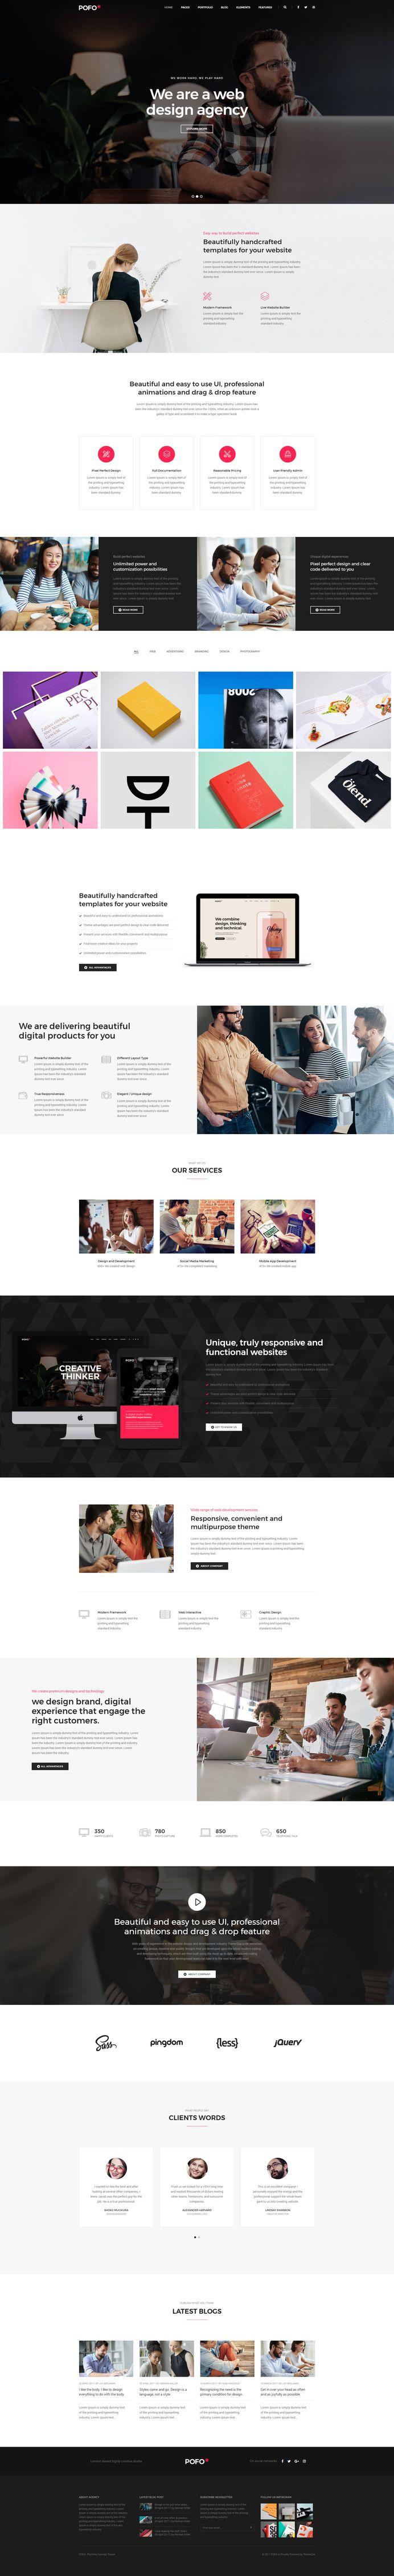 Pofo - #Creative #Portfolio and #Blog #WordPress Theme for #Corporate by #ThemeZaa